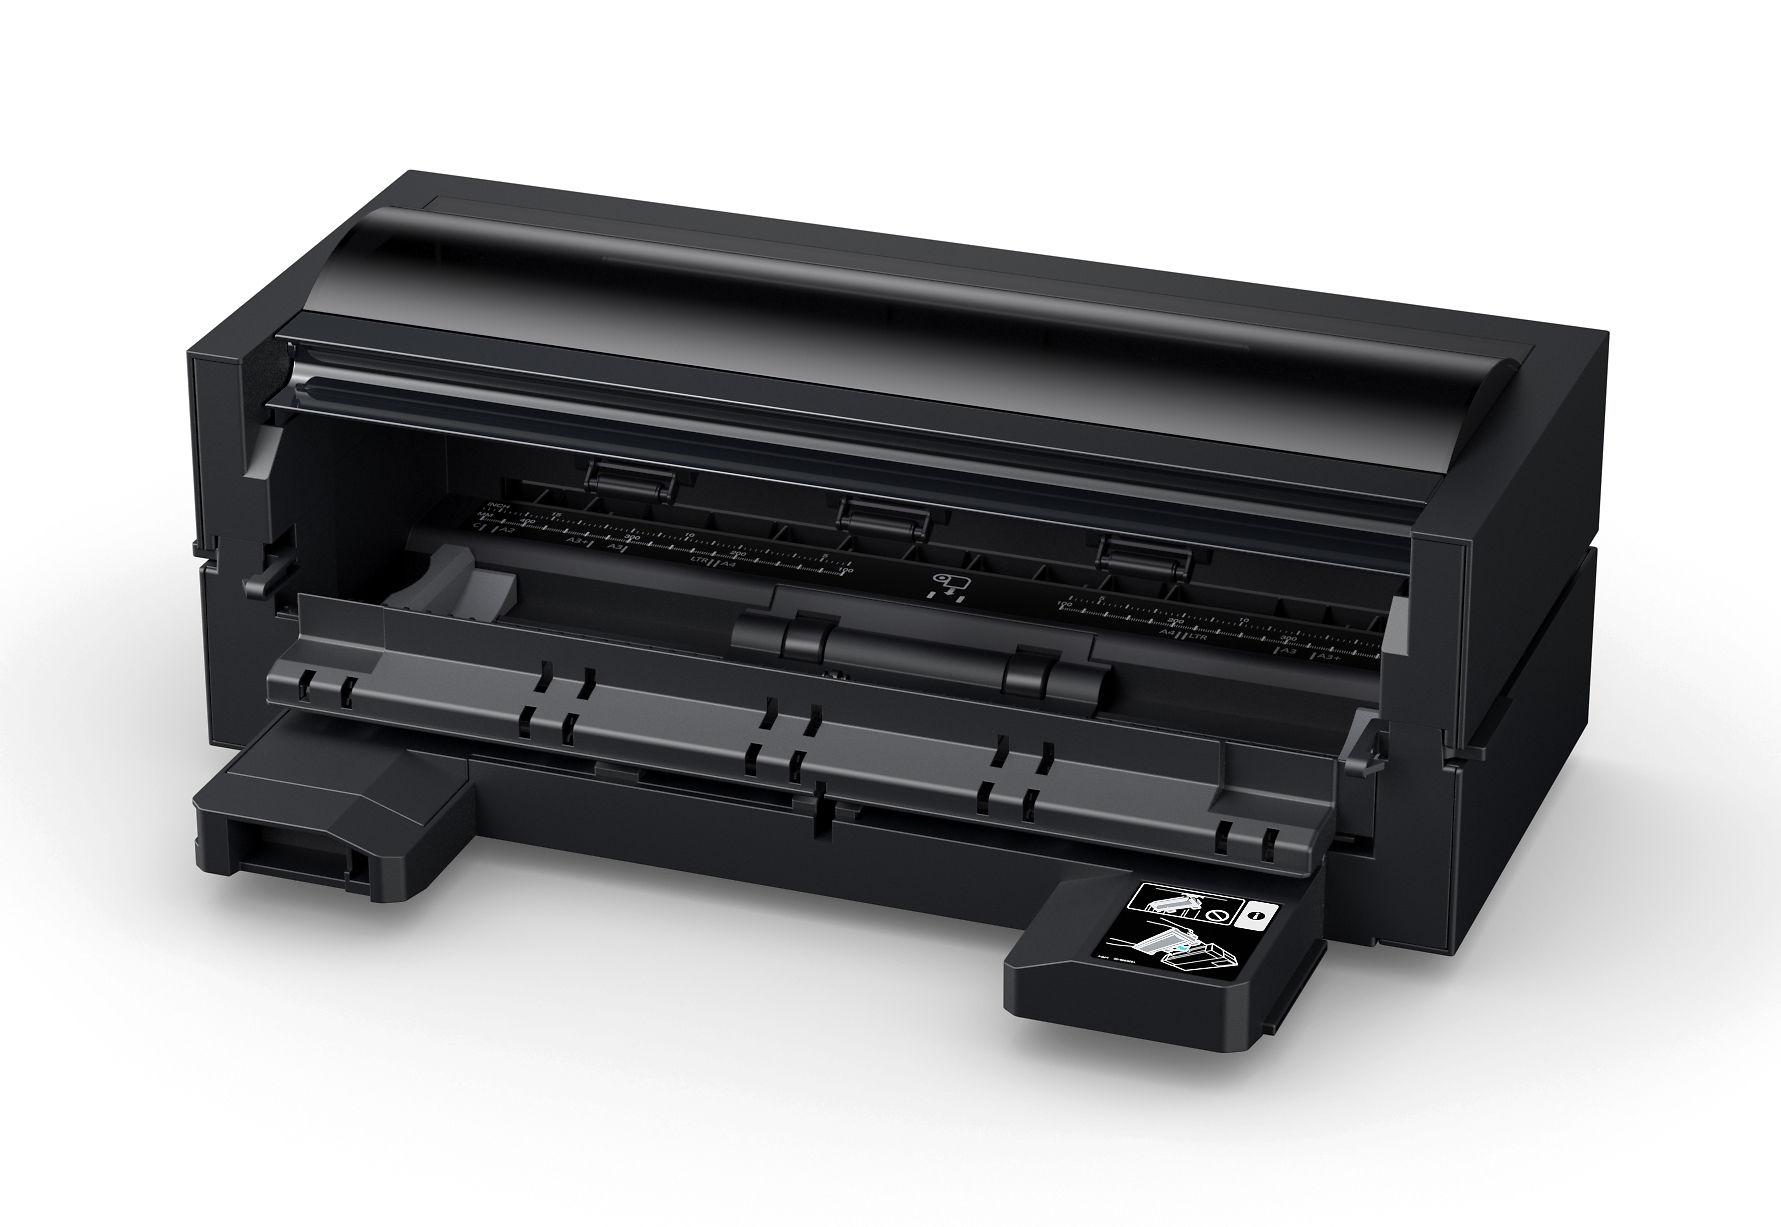 Epson SureColor P906 A2 Inkjet Printer Image